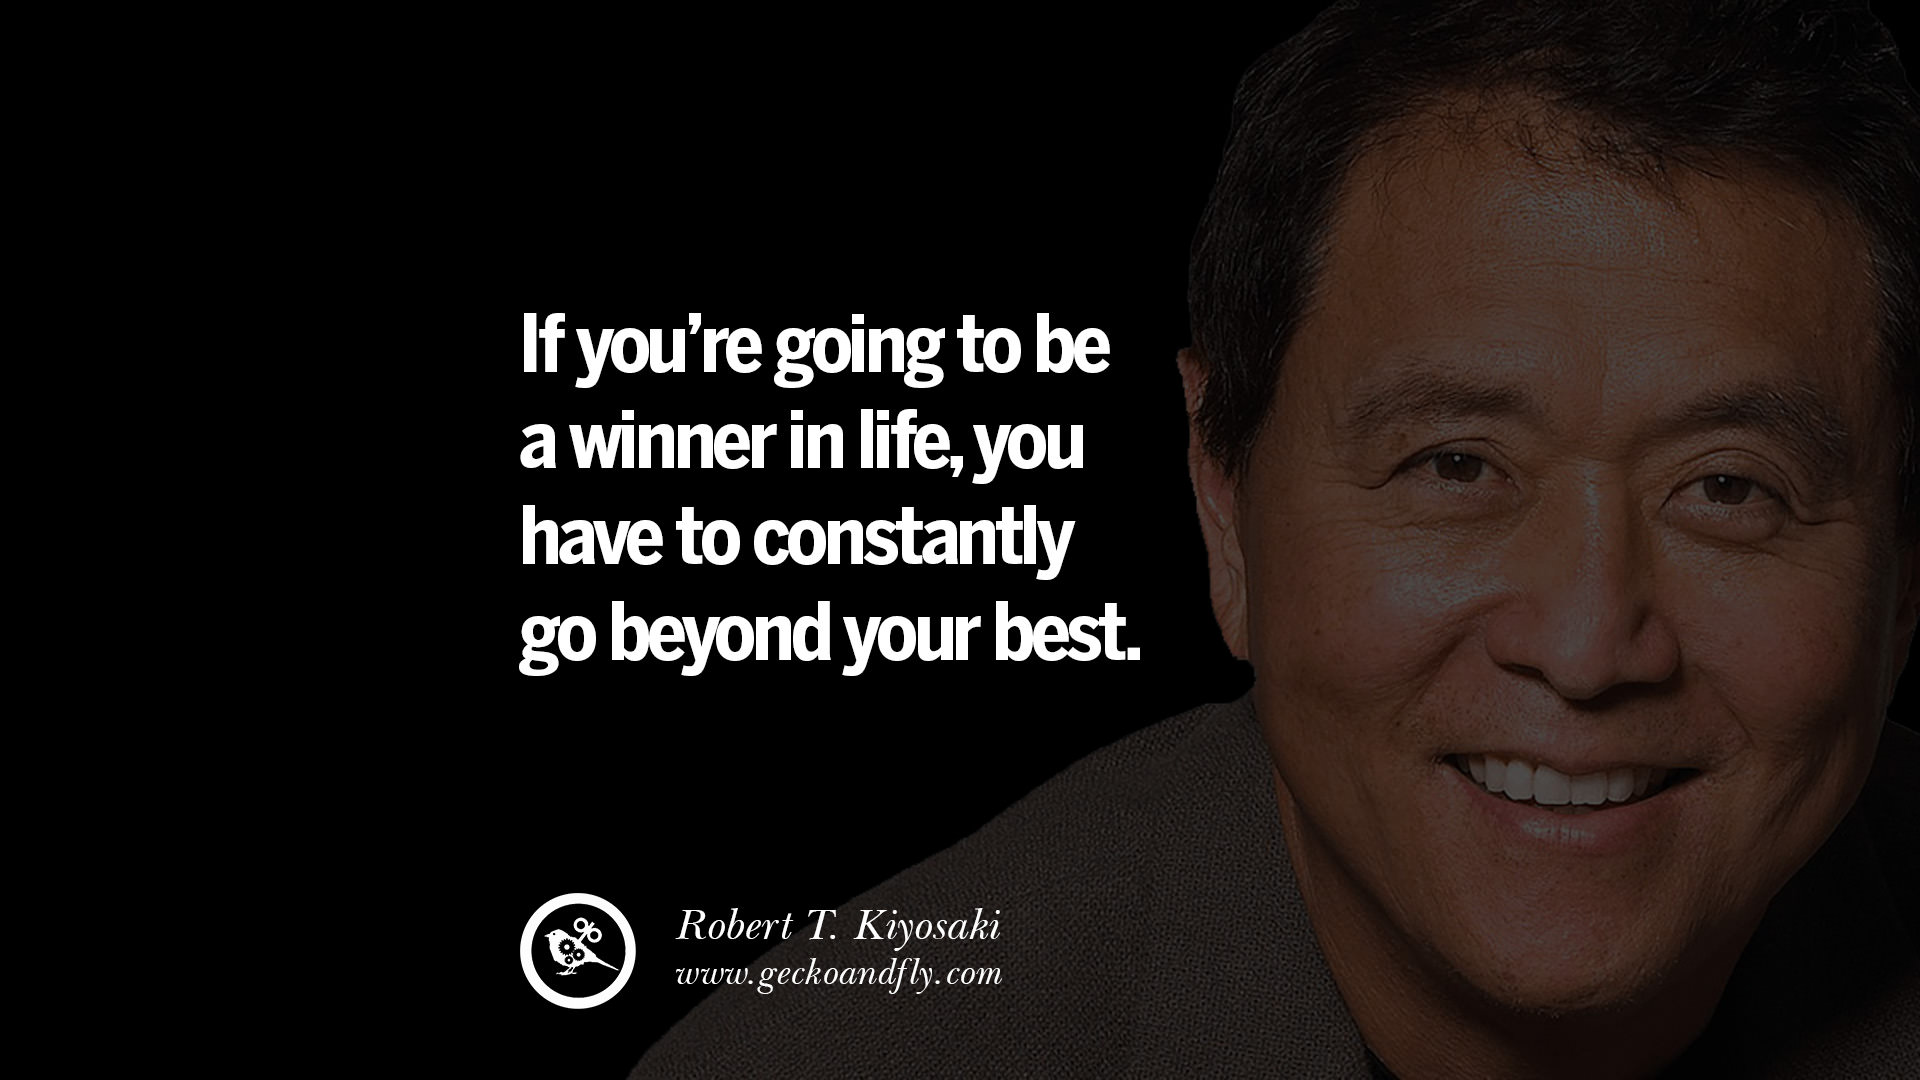 60 Motivational Robert T Kiyosaki Quotes For Selling